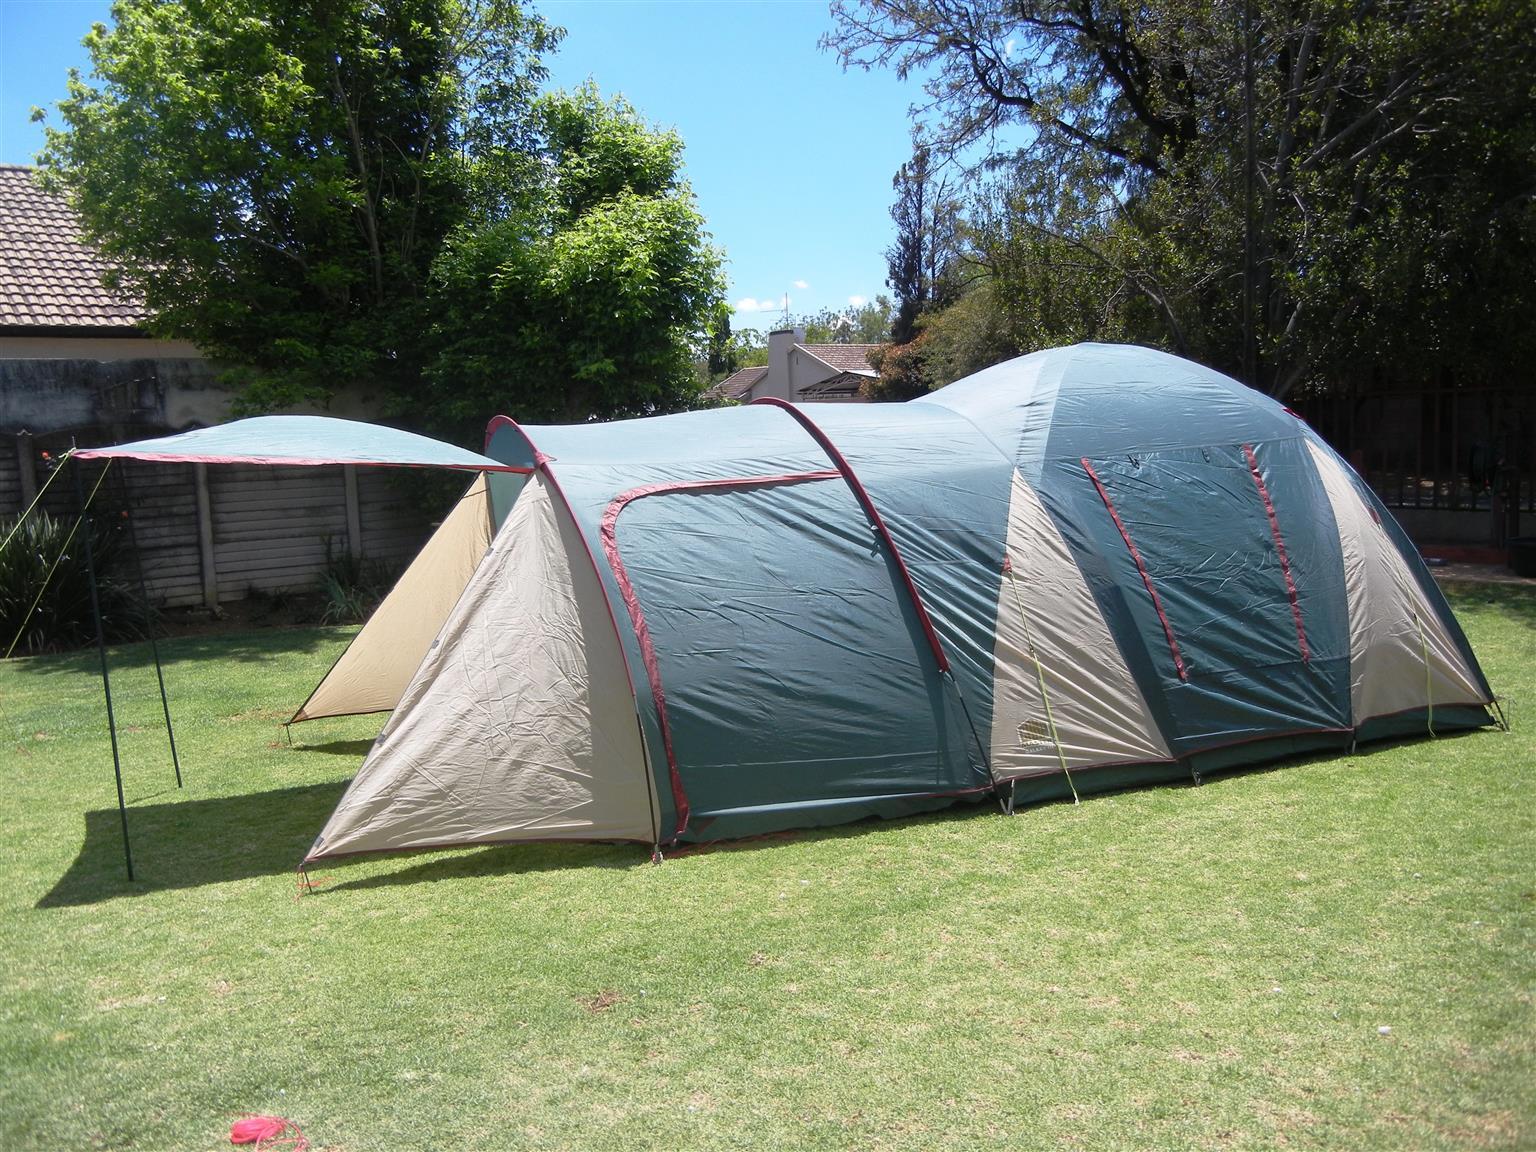 6 Man Campmaster tent